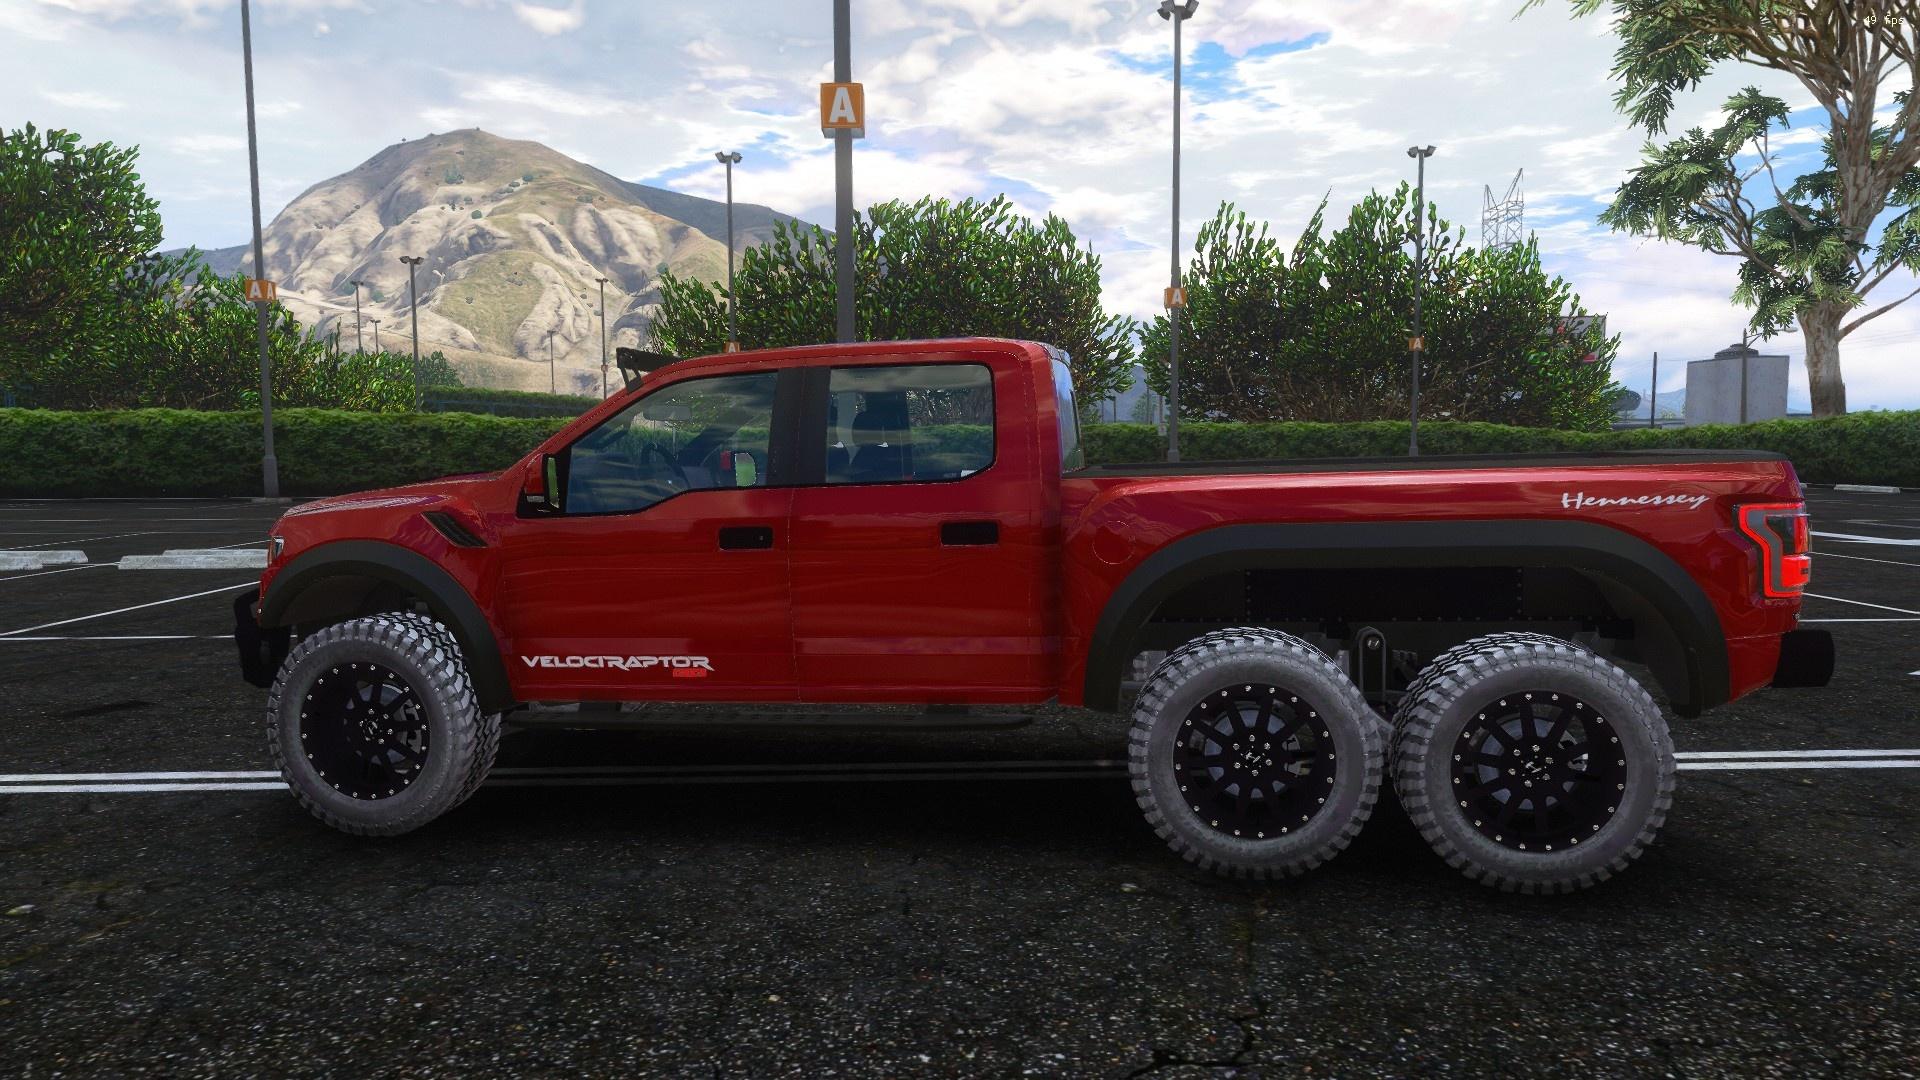 2018 Ford Velociraptor 6x6 Add On Gta5 Mods Com